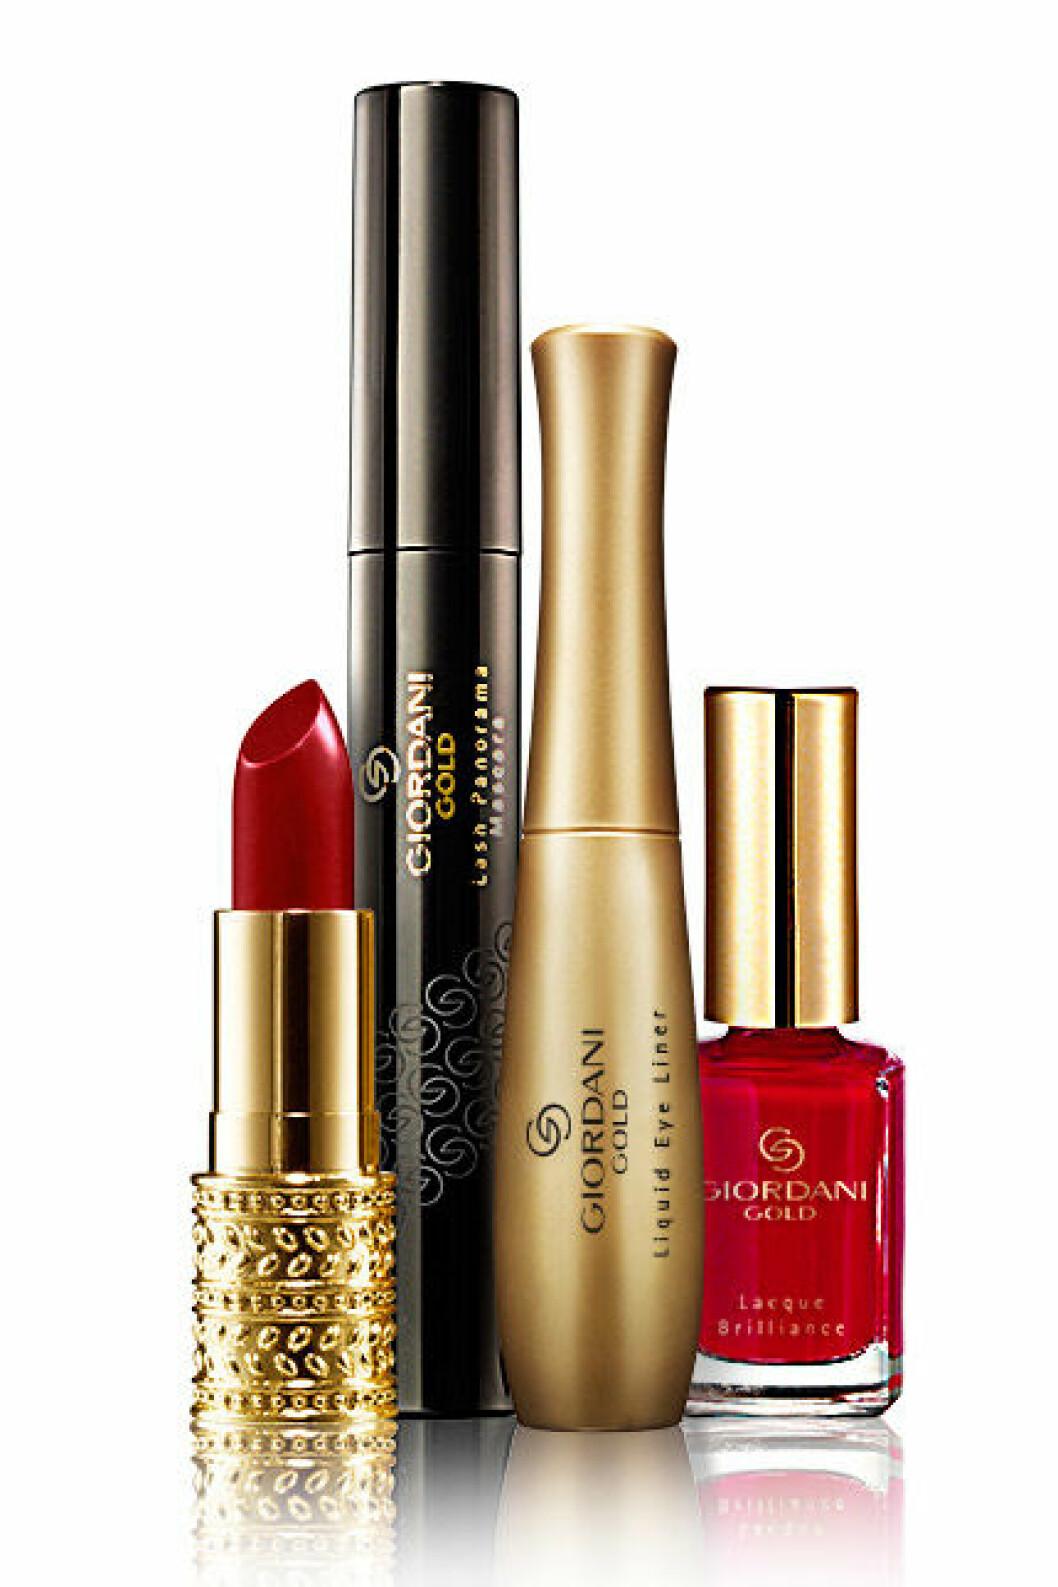 Makeupkitet Red by Elsa Ekman för Oriflame kostar 349 kr.